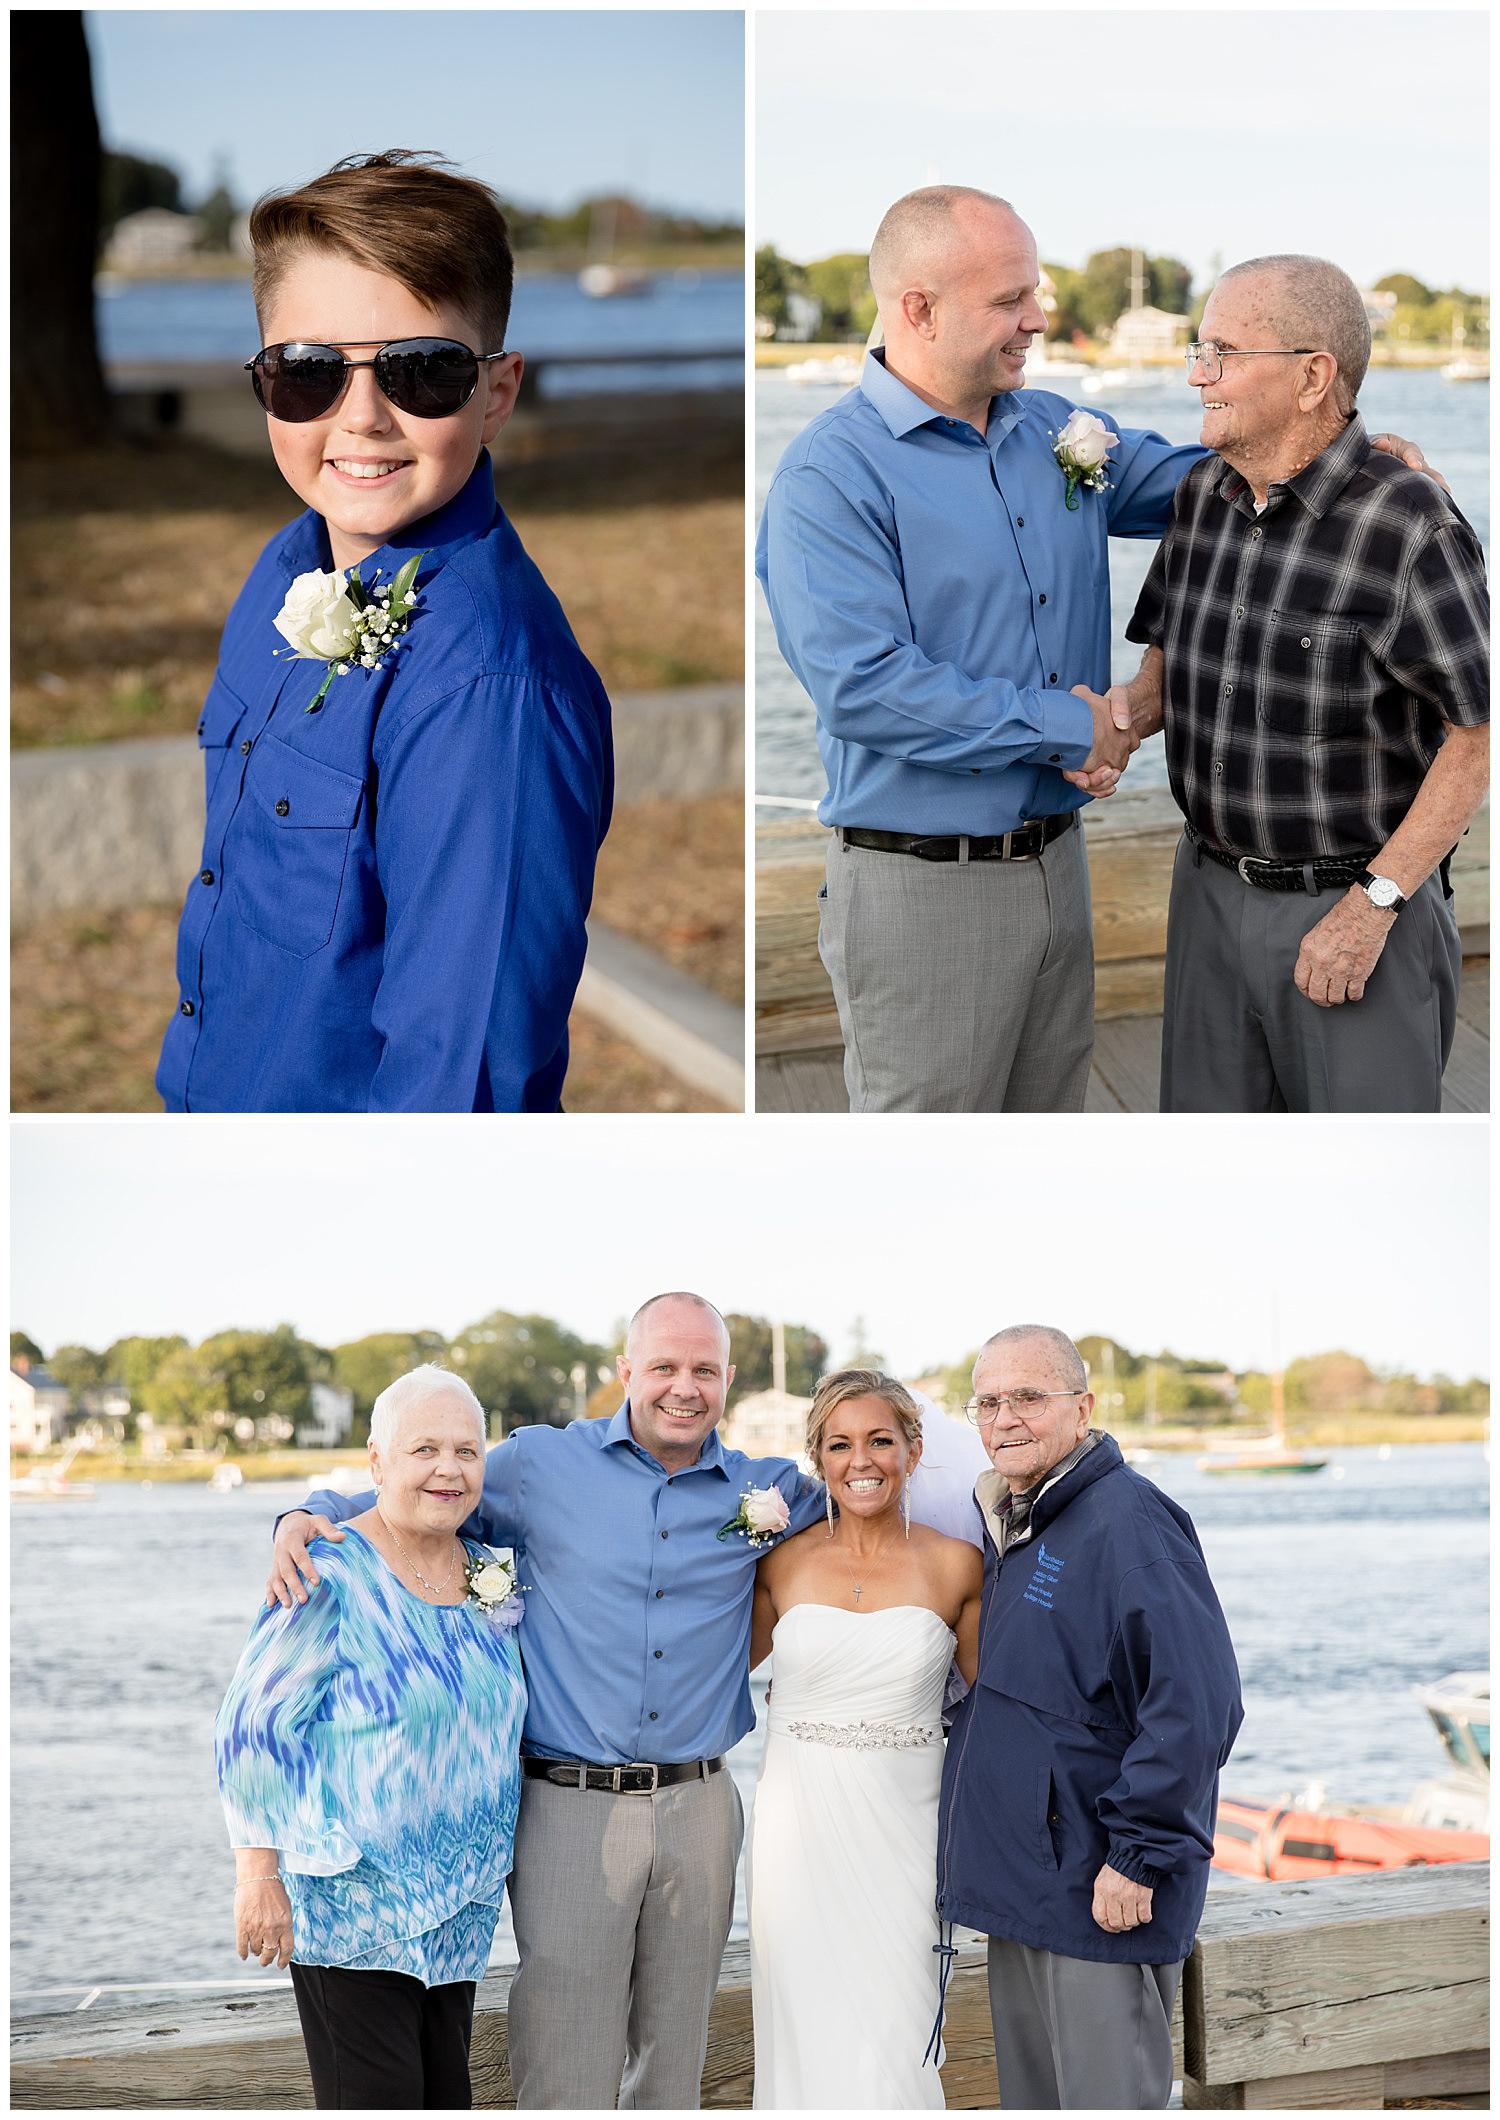 boston-wedding-photographer-26-north-studios-016.jpg